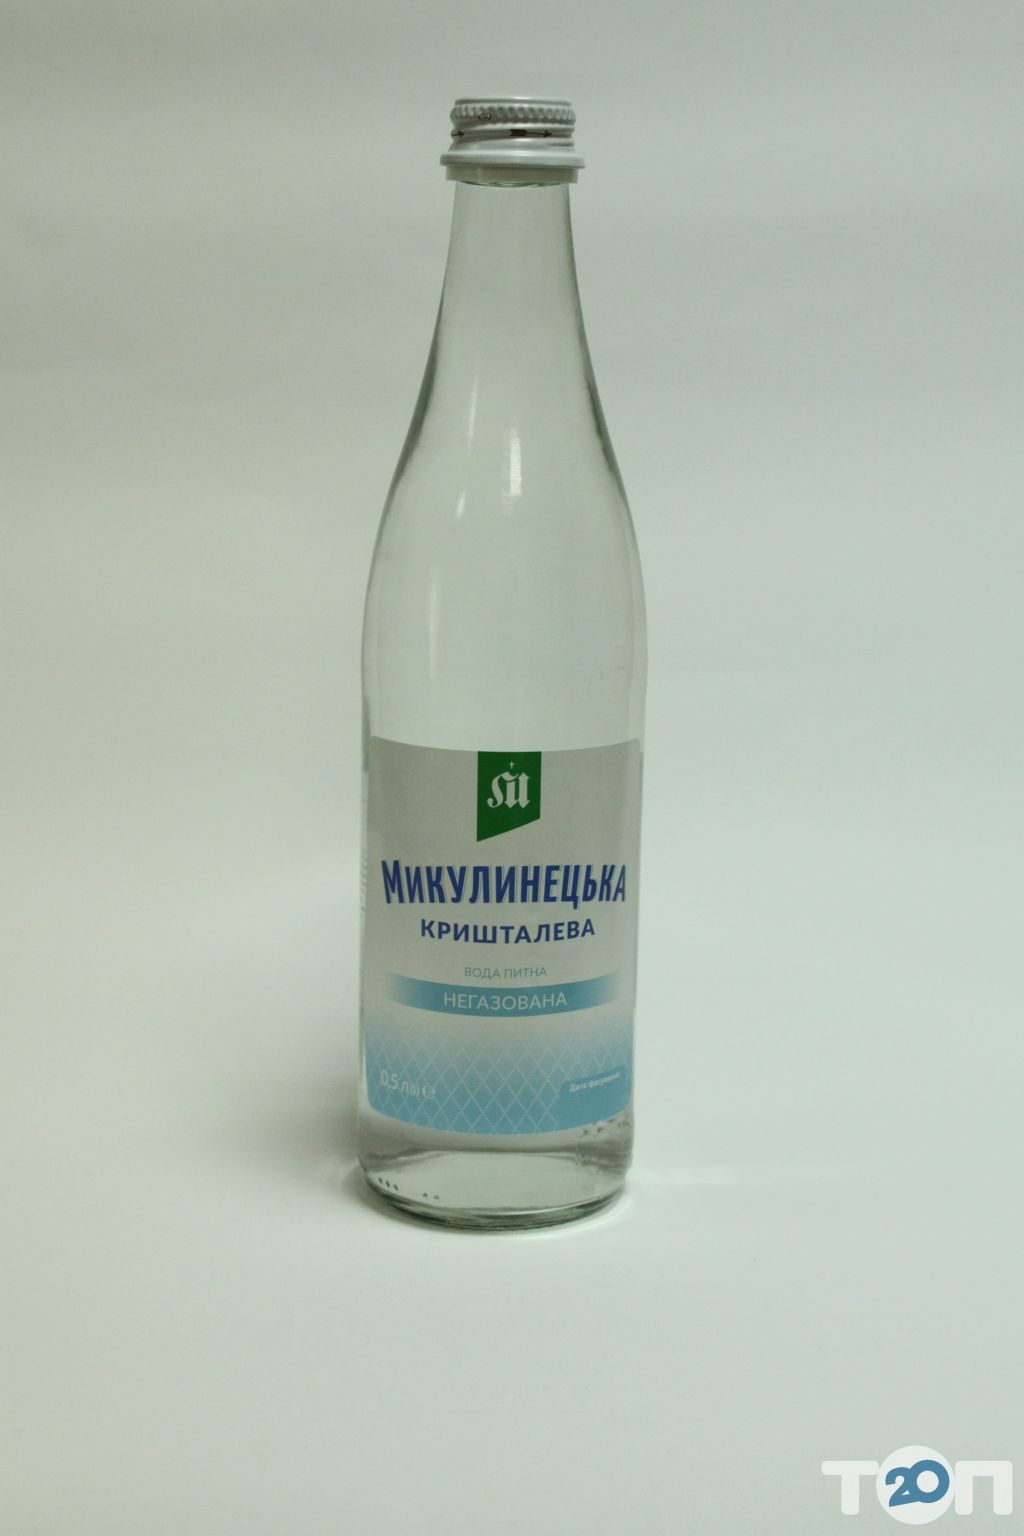 Микулинецький Бровар, виробник безалкогольних напоїв - фото 7